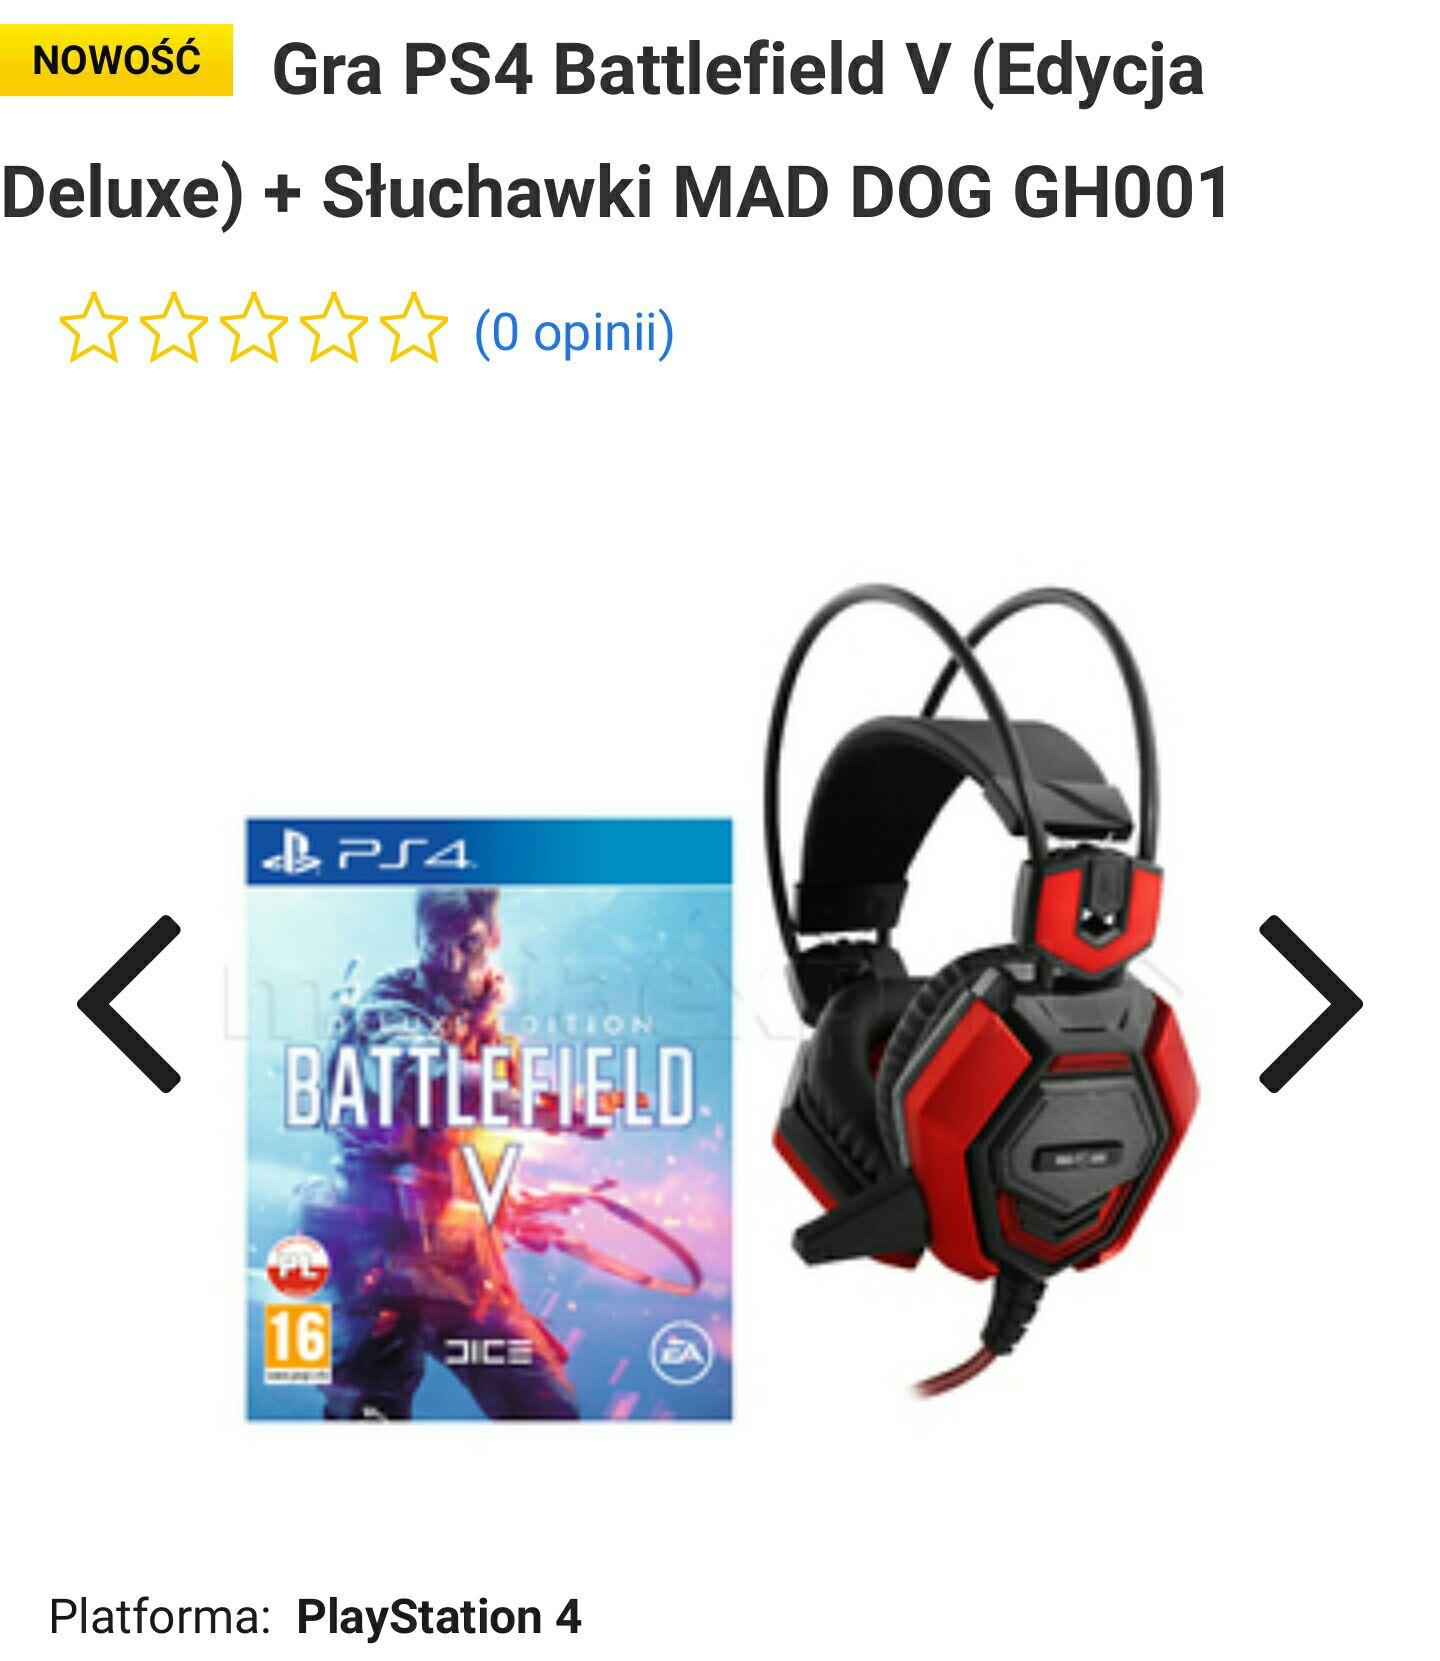 Battlefield V PS4 (Edycja Deluxe)+Słuchawki MAD DOG GH001 GRATIS